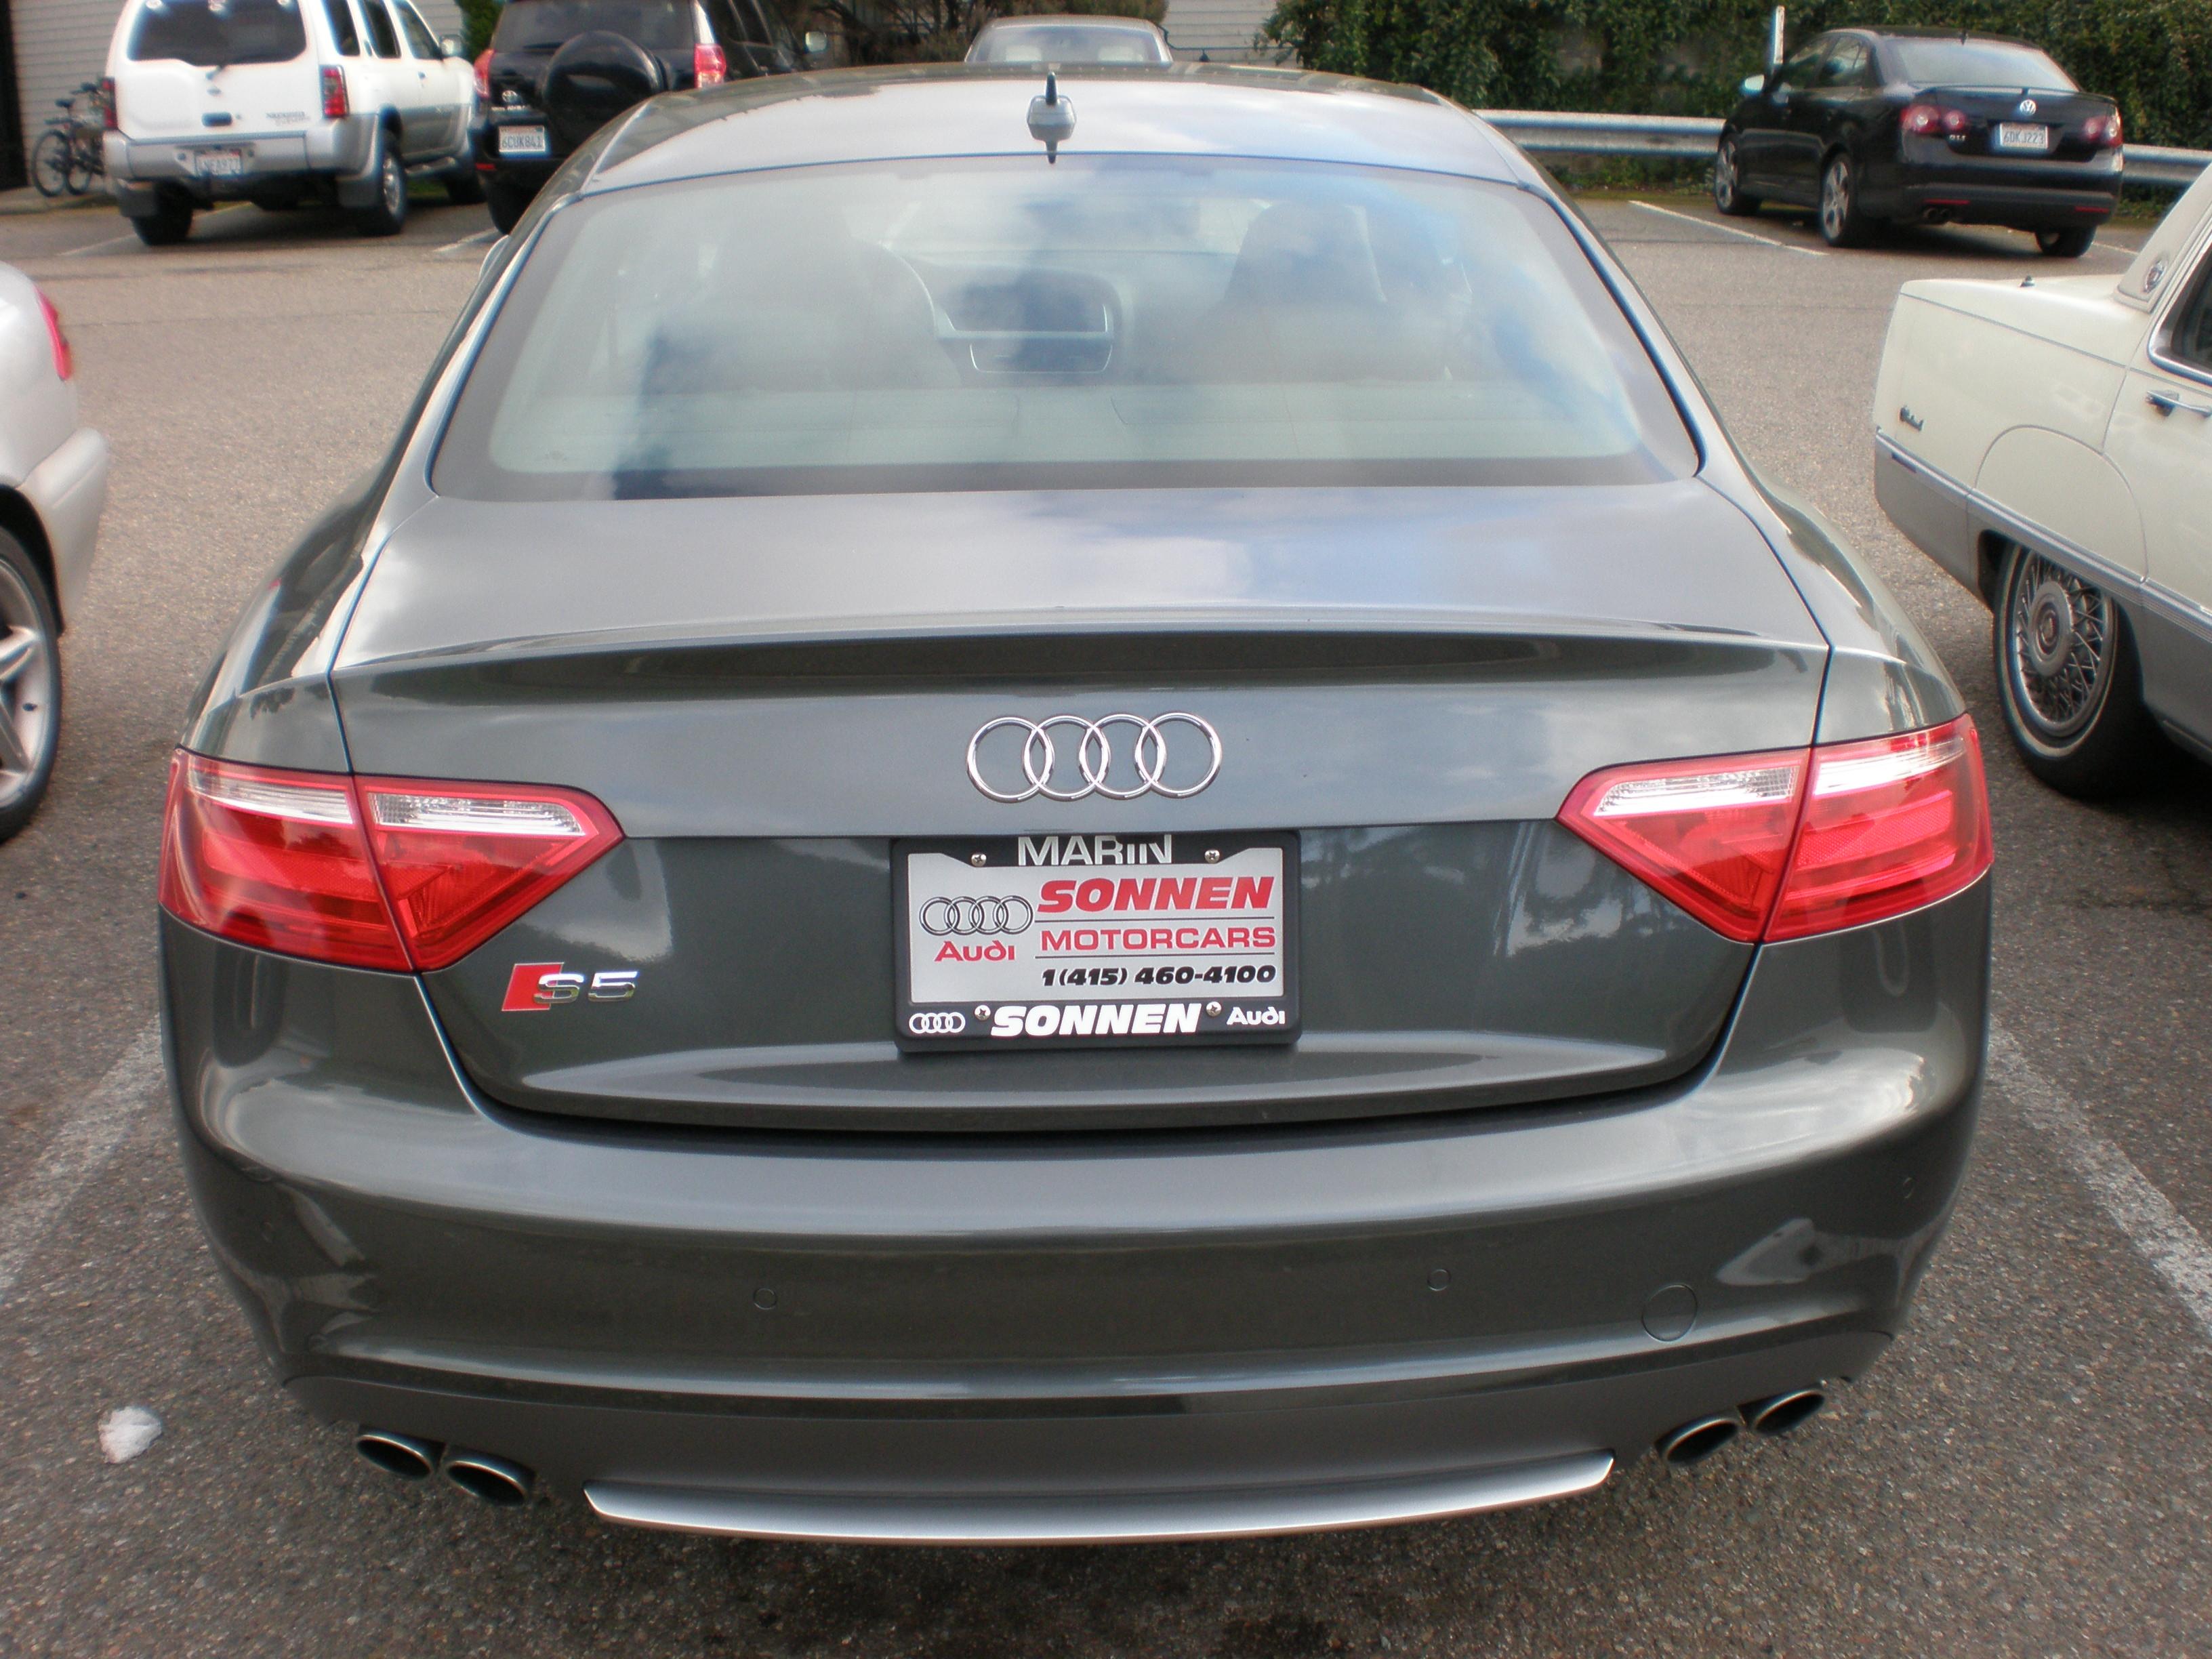 2009 Audi S5 Image 13